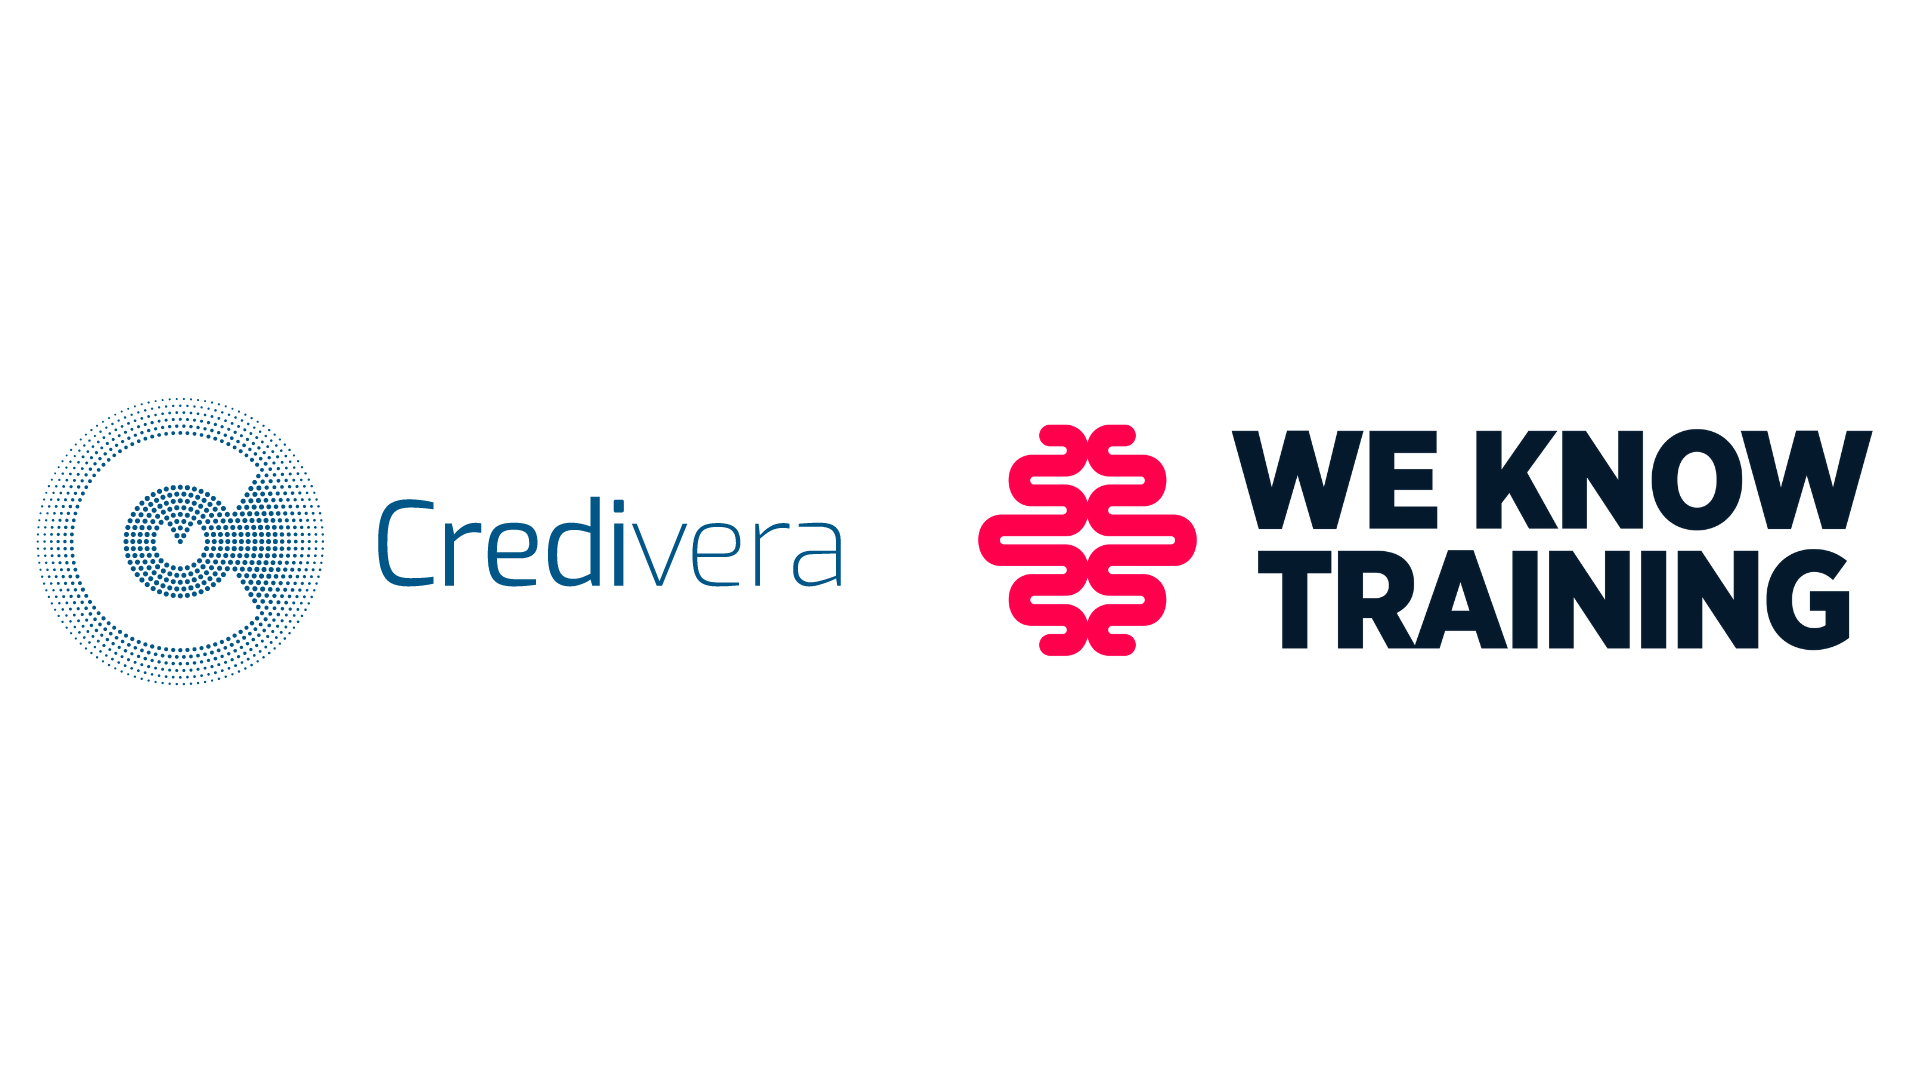 Credivera & WKT-2